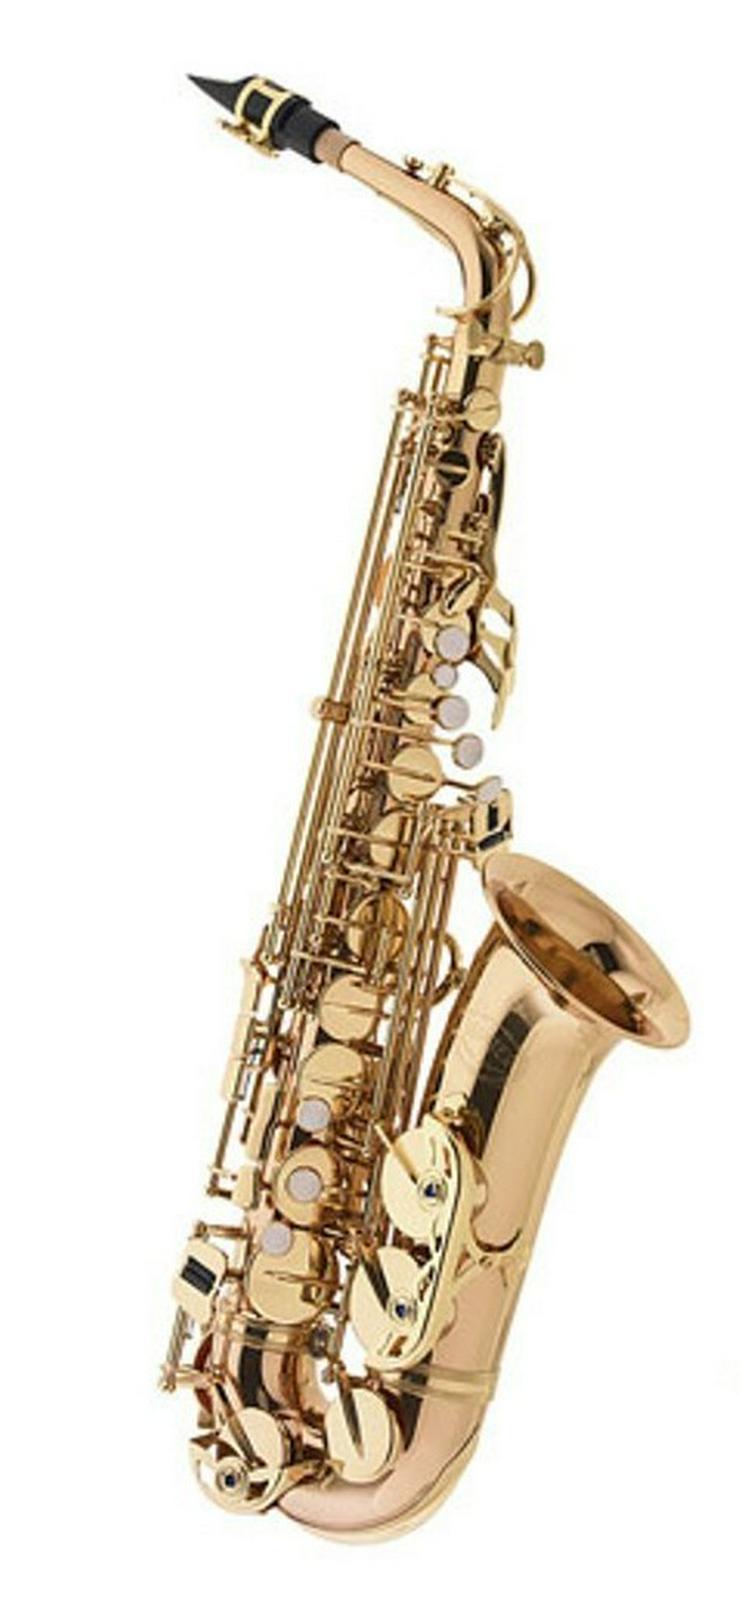 JUPITER Es - Altsaxophon, Mod. JP 769 RB II - Blasinstrumente - Bild 1